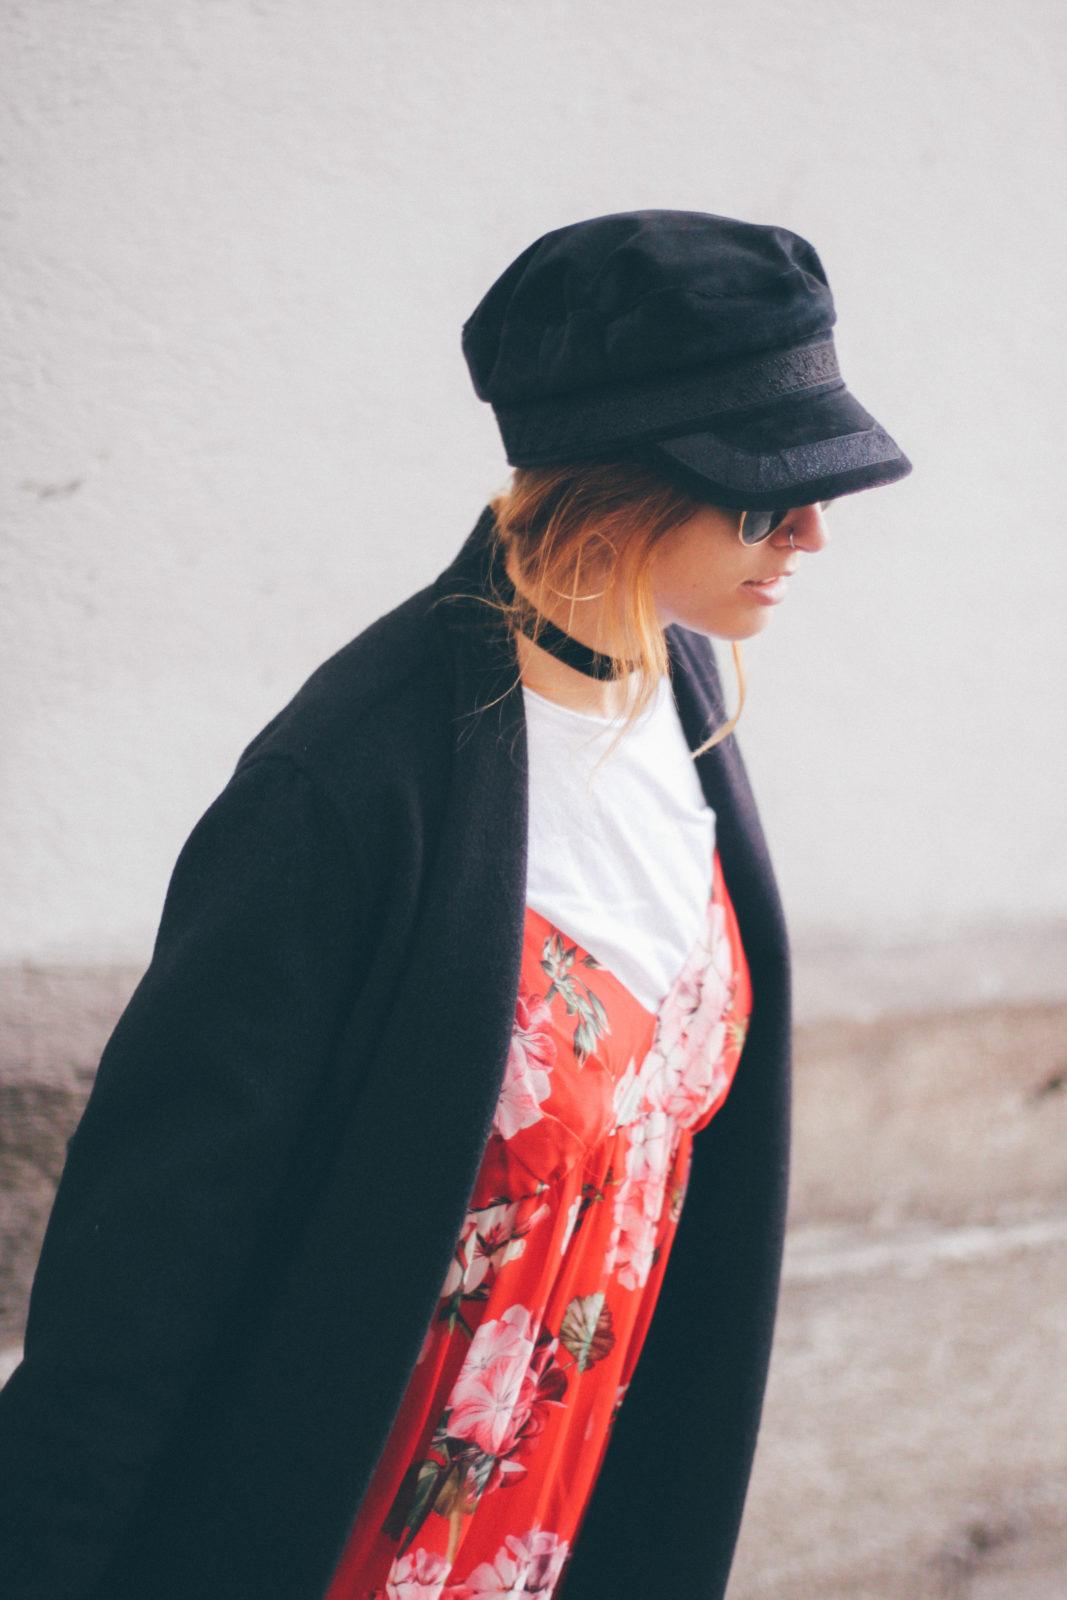 baker_boy_hat_vestido_con_camiseta_gorra_marinera_botines_hebillas_fall_2016_trends_street_style_outfits_donkeycool-10